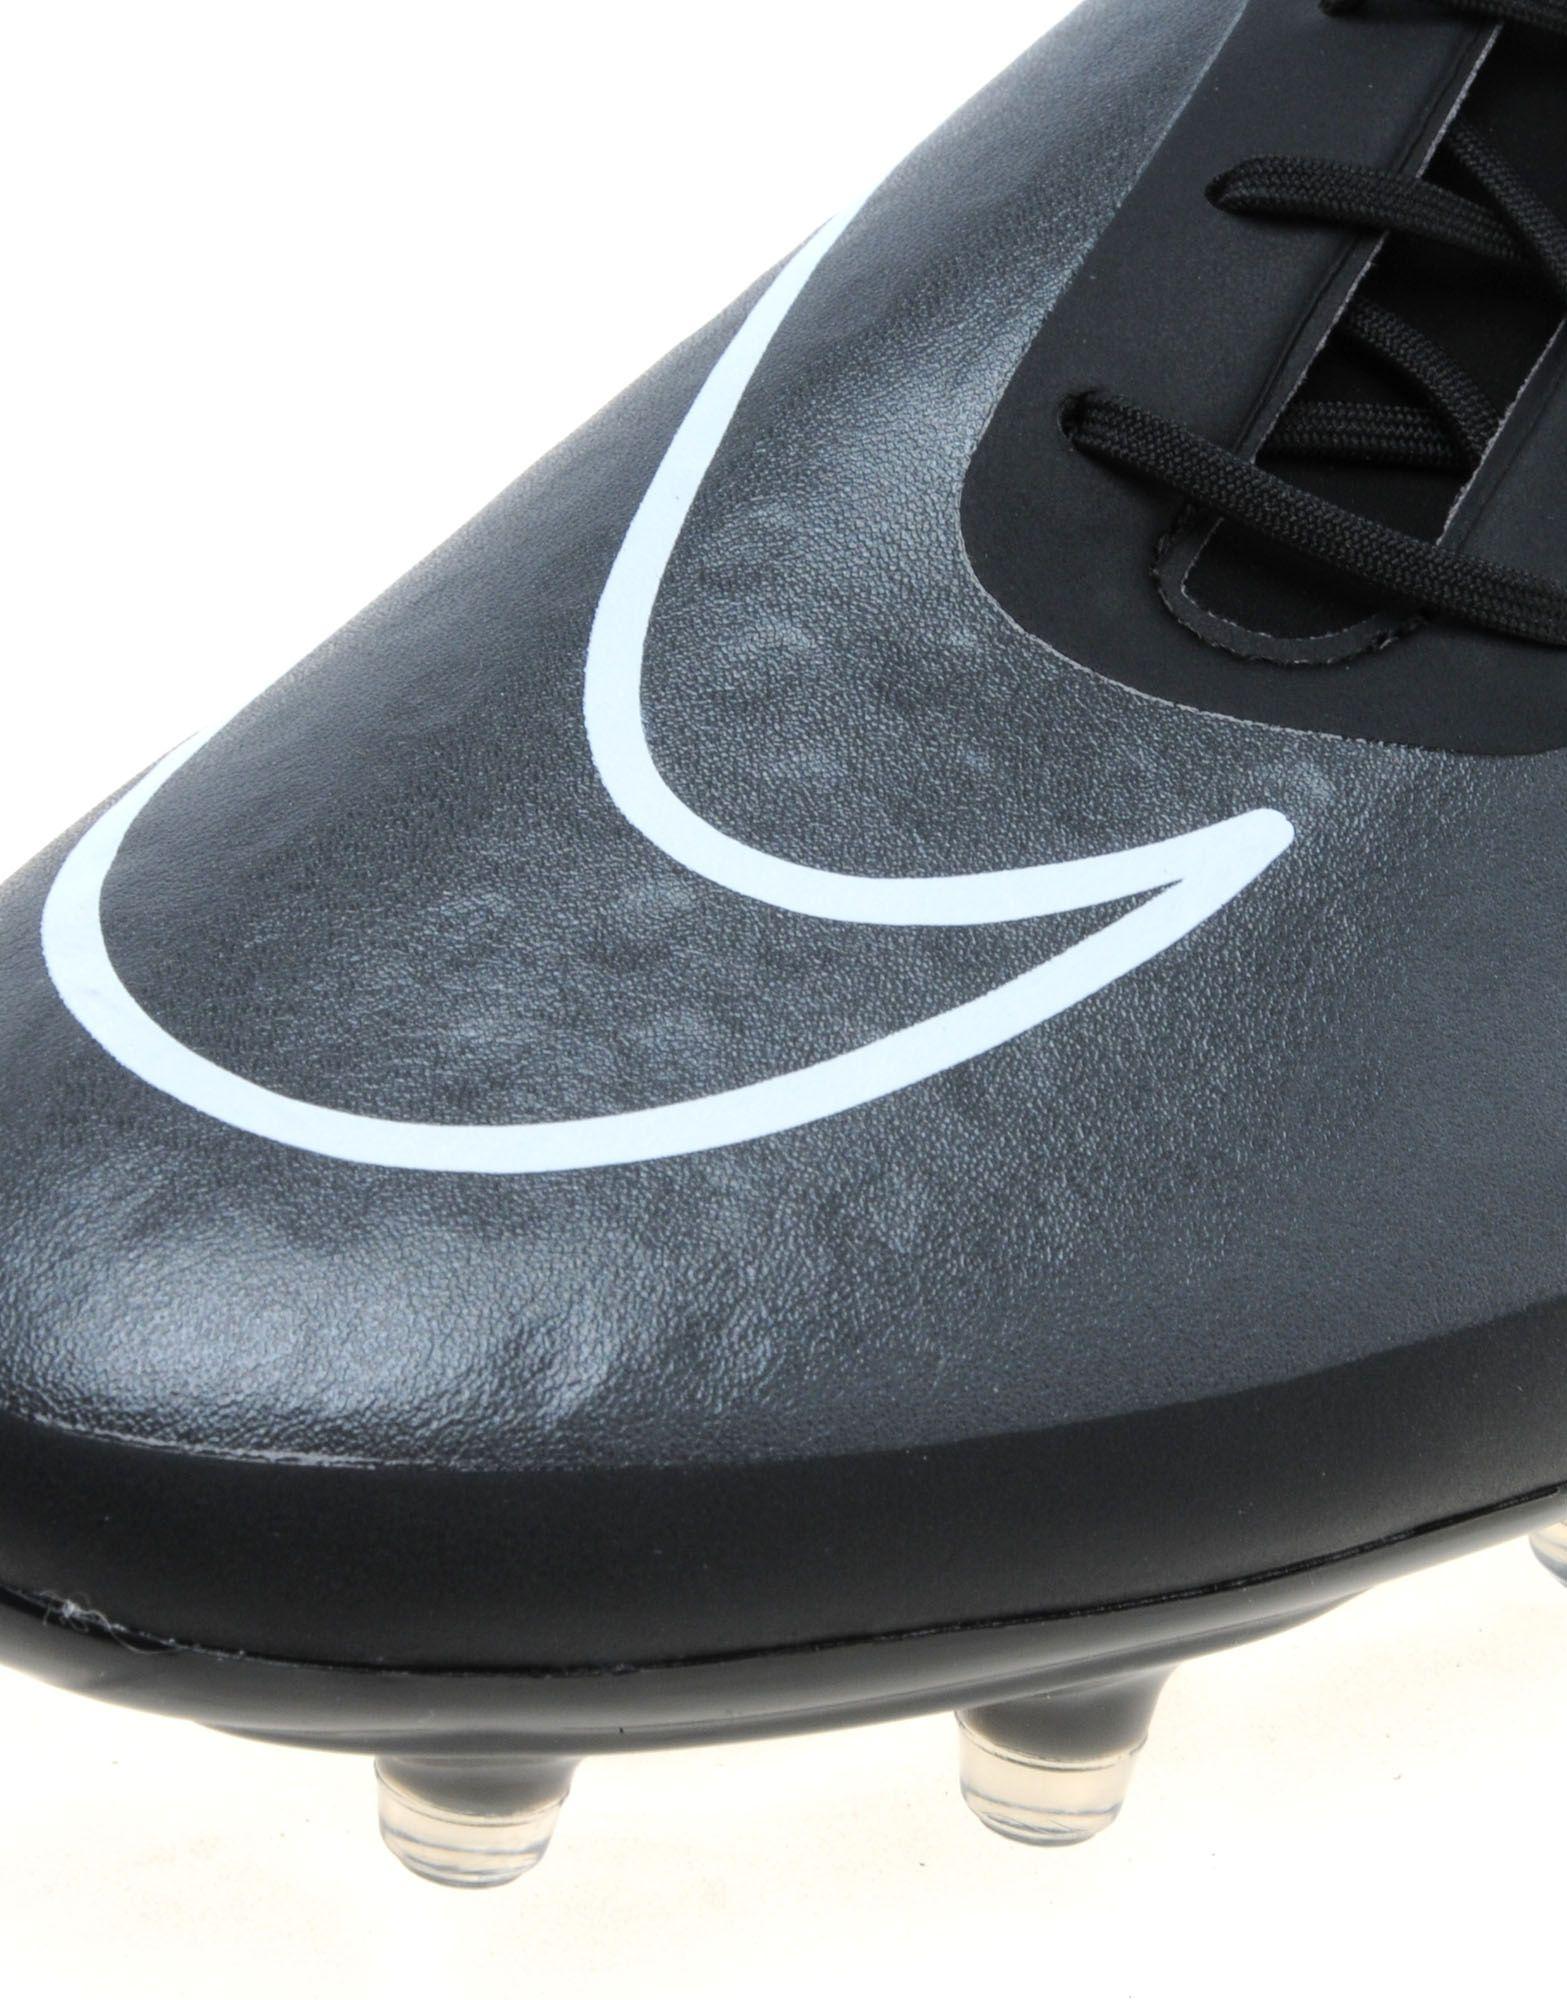 Nike Hypervenom Phatal Firm Ground